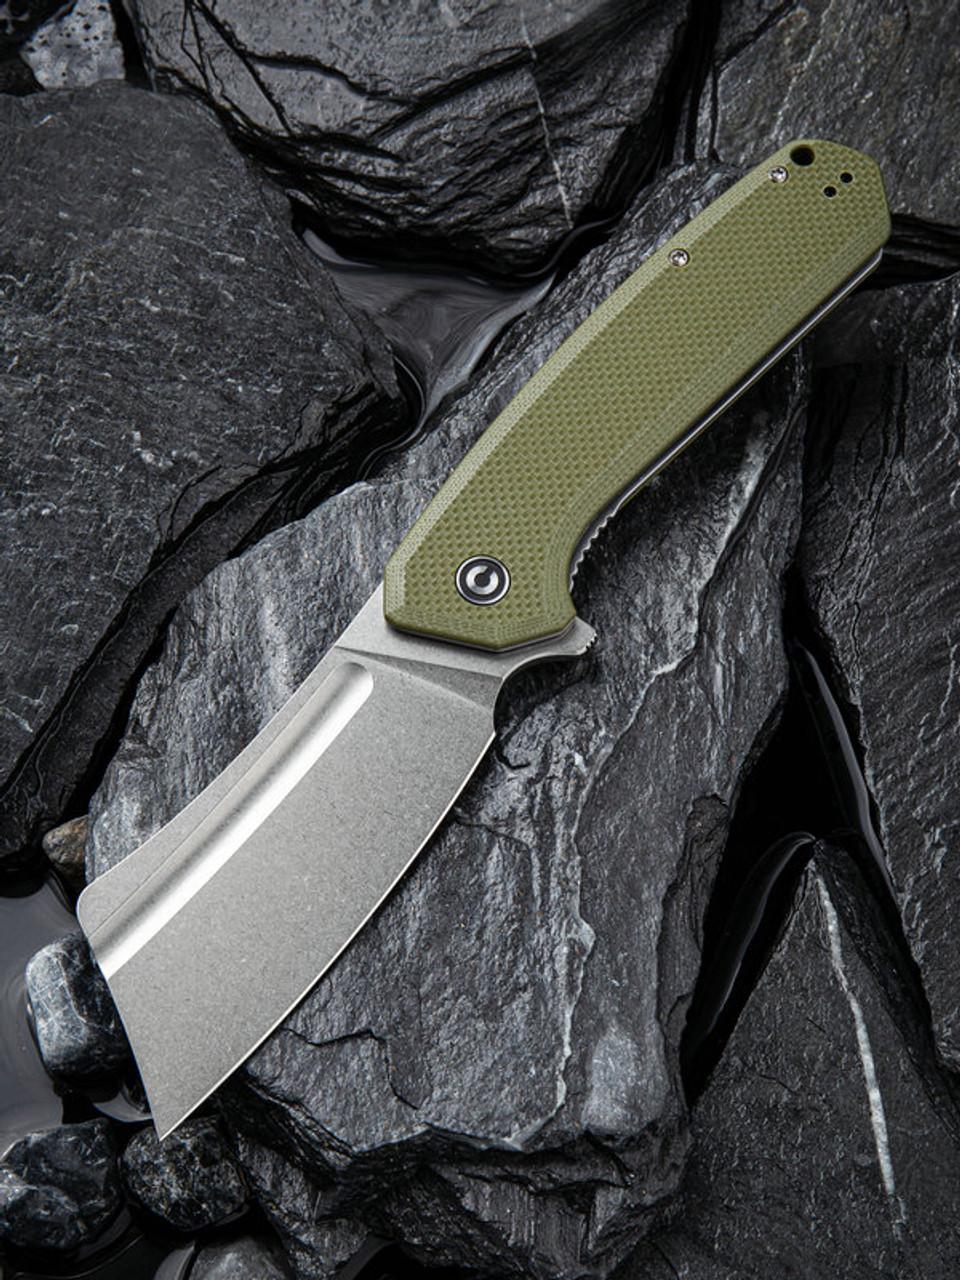 "Civivi Bullmastiff Linerlock OD Green C2006A, 3.83"" 9Cr18MoV Stonewashed Plain Blade, OD Green G10 Handle"